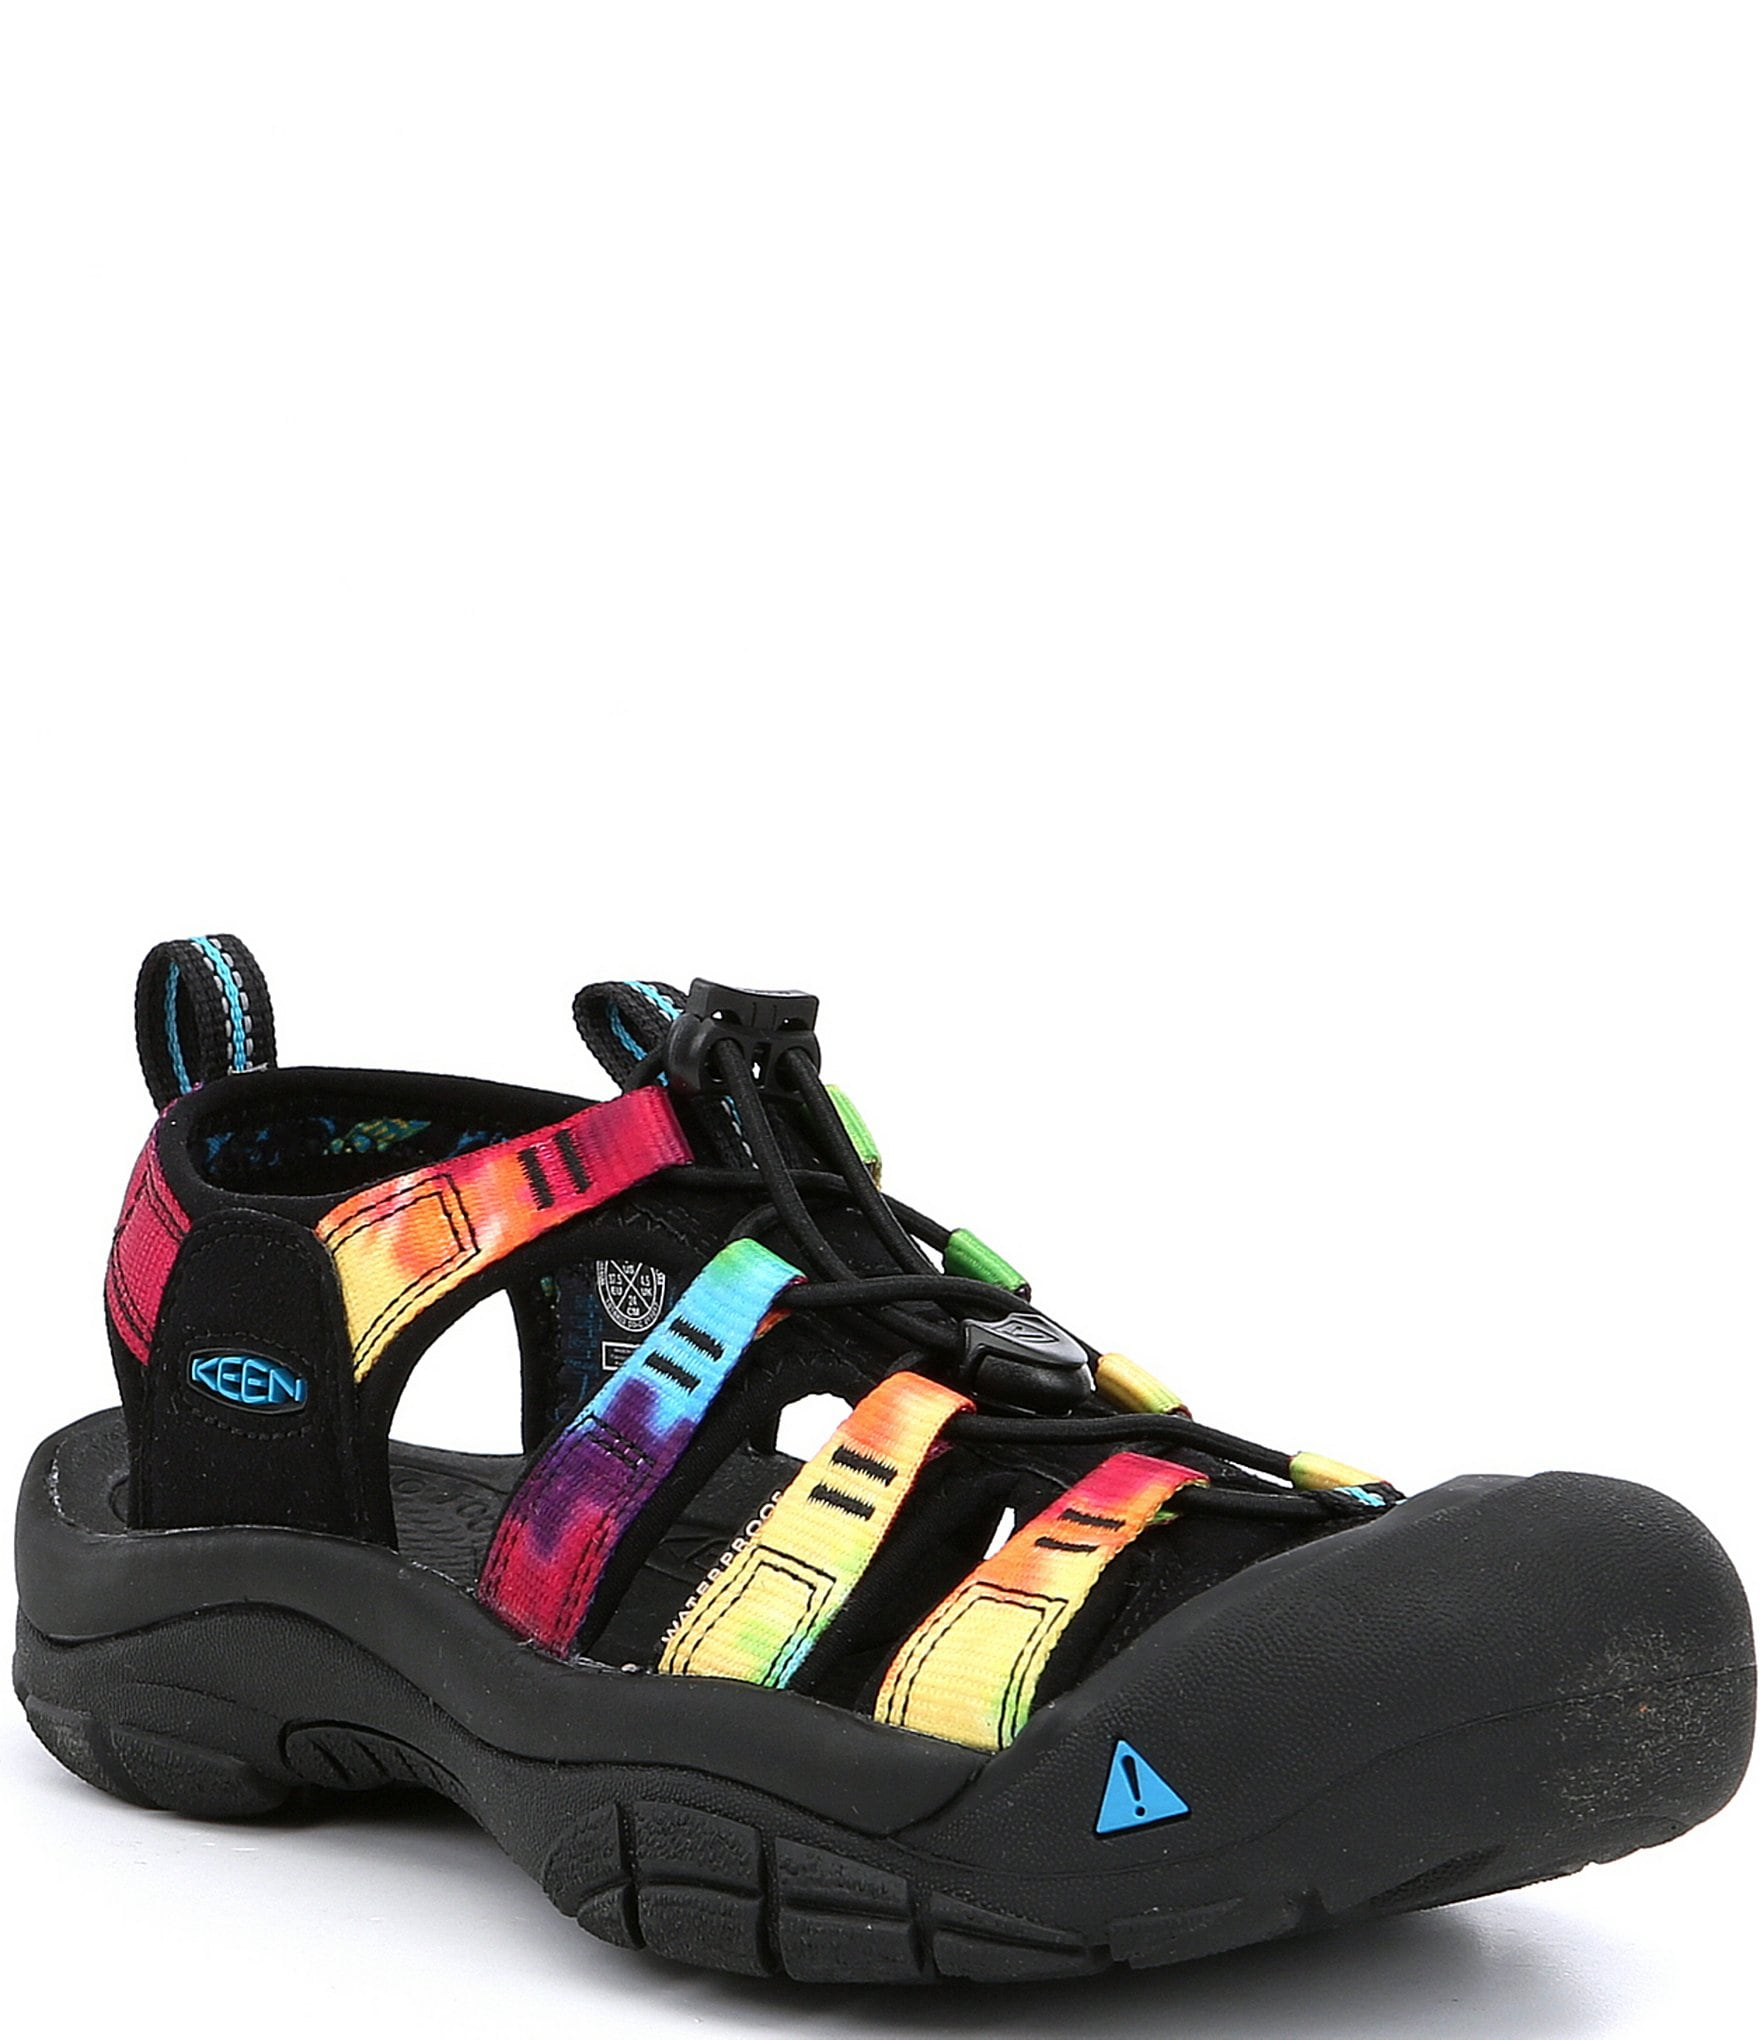 4b07049f501 Keen Shoes | Dillard's